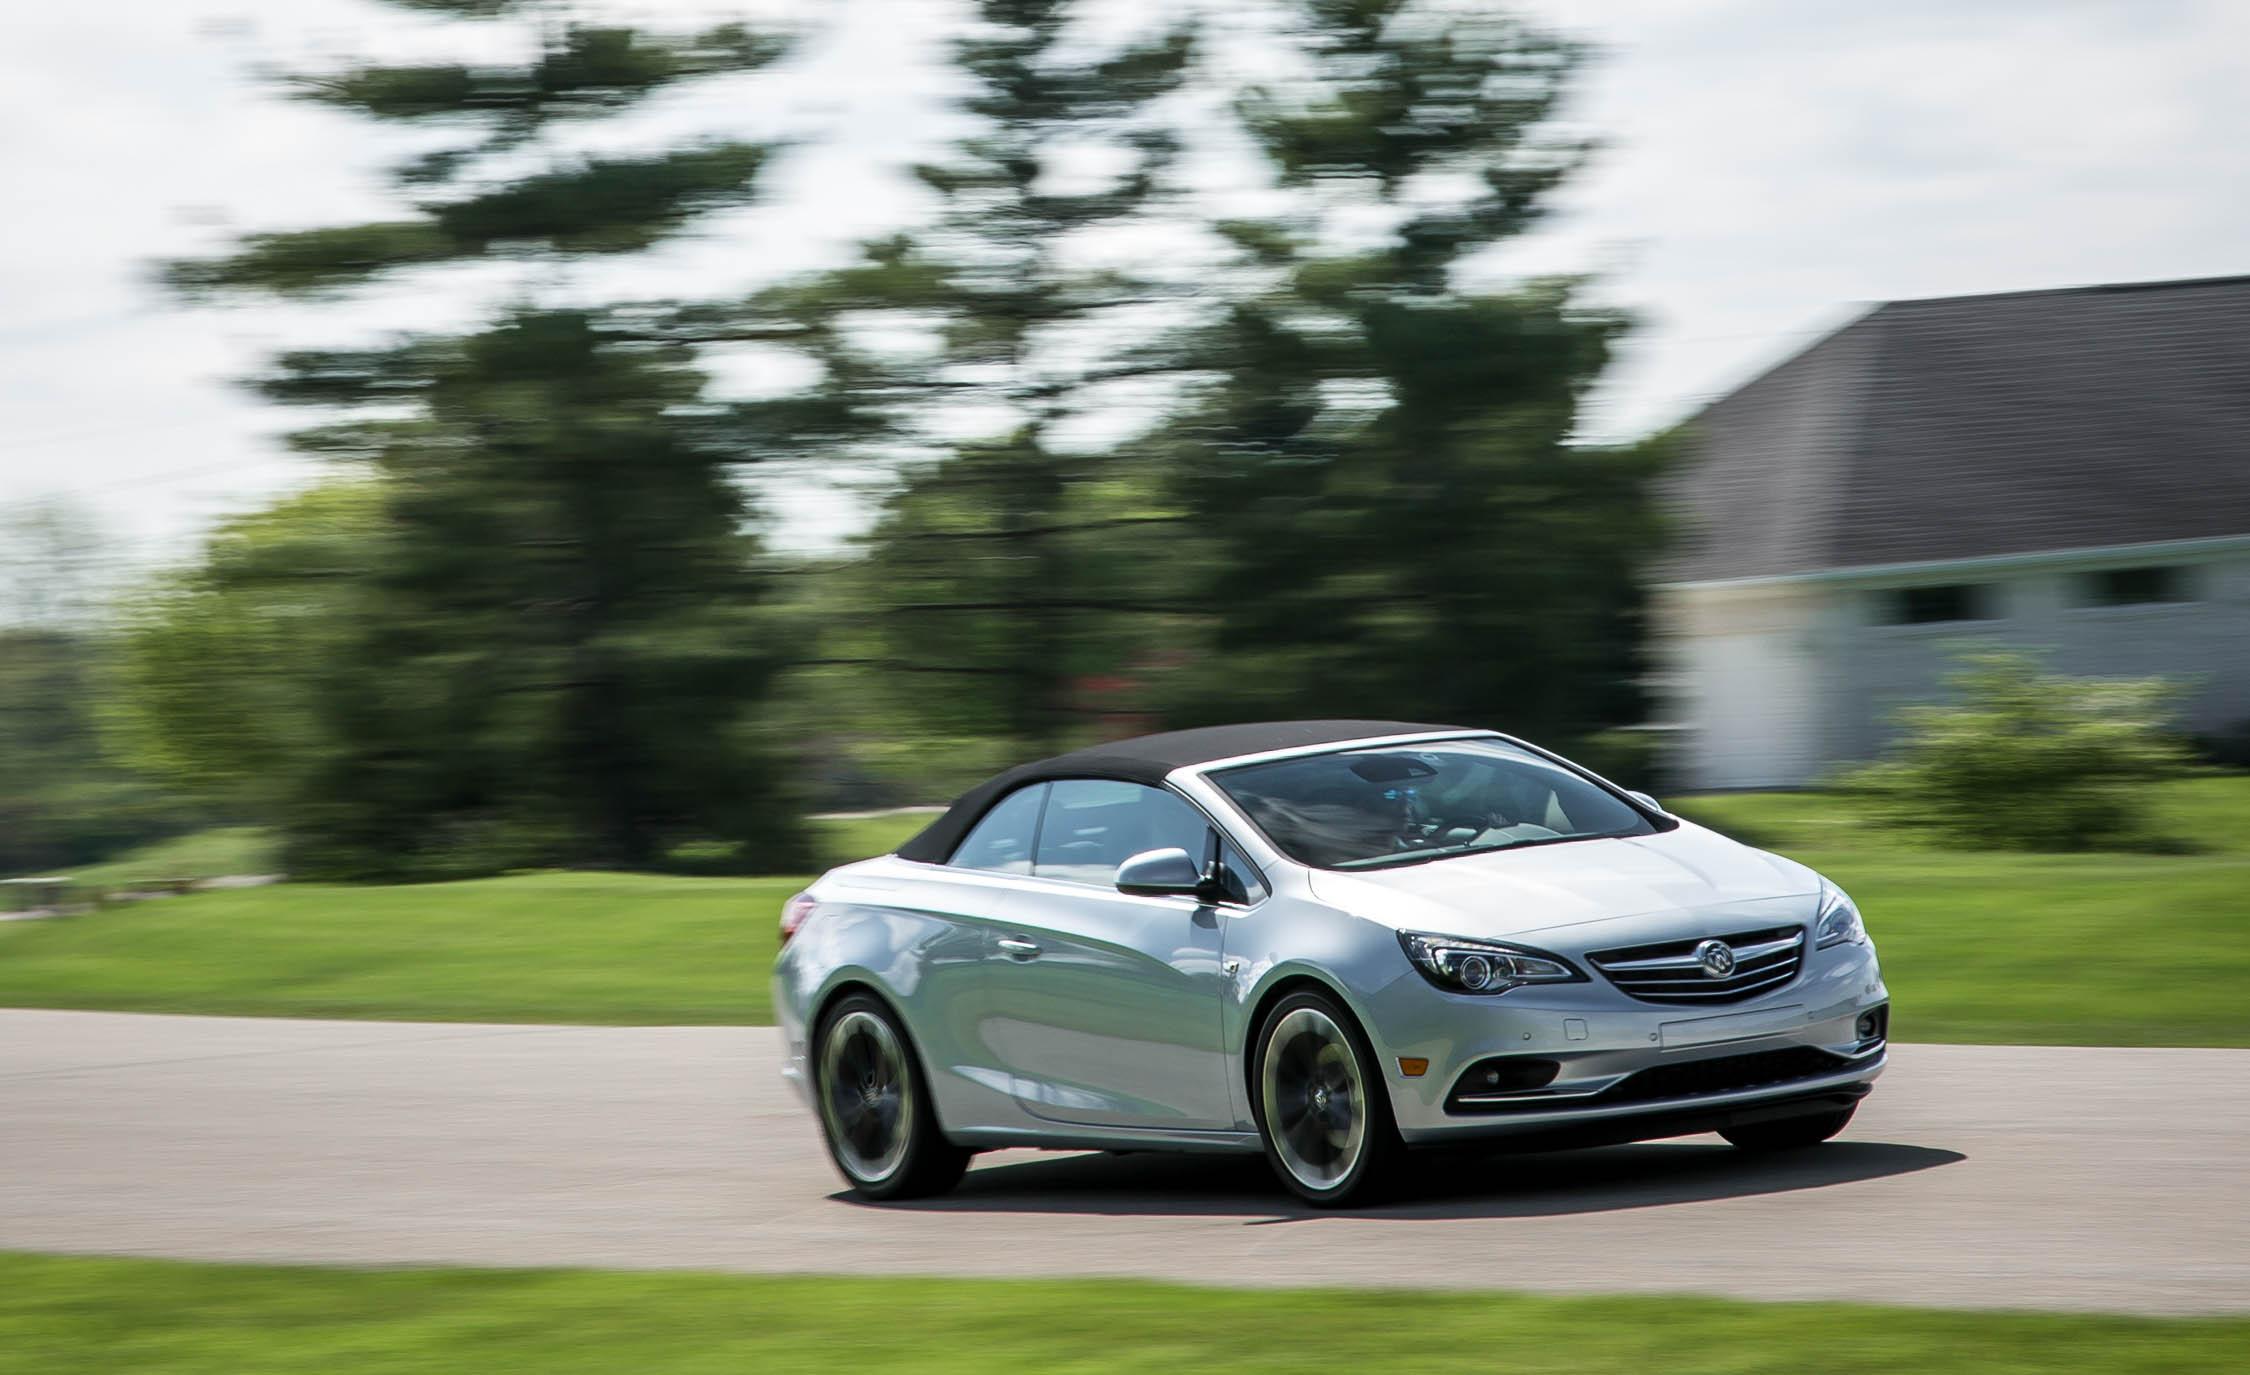 2016 Buick Cascada Premium (View 19 of 24)